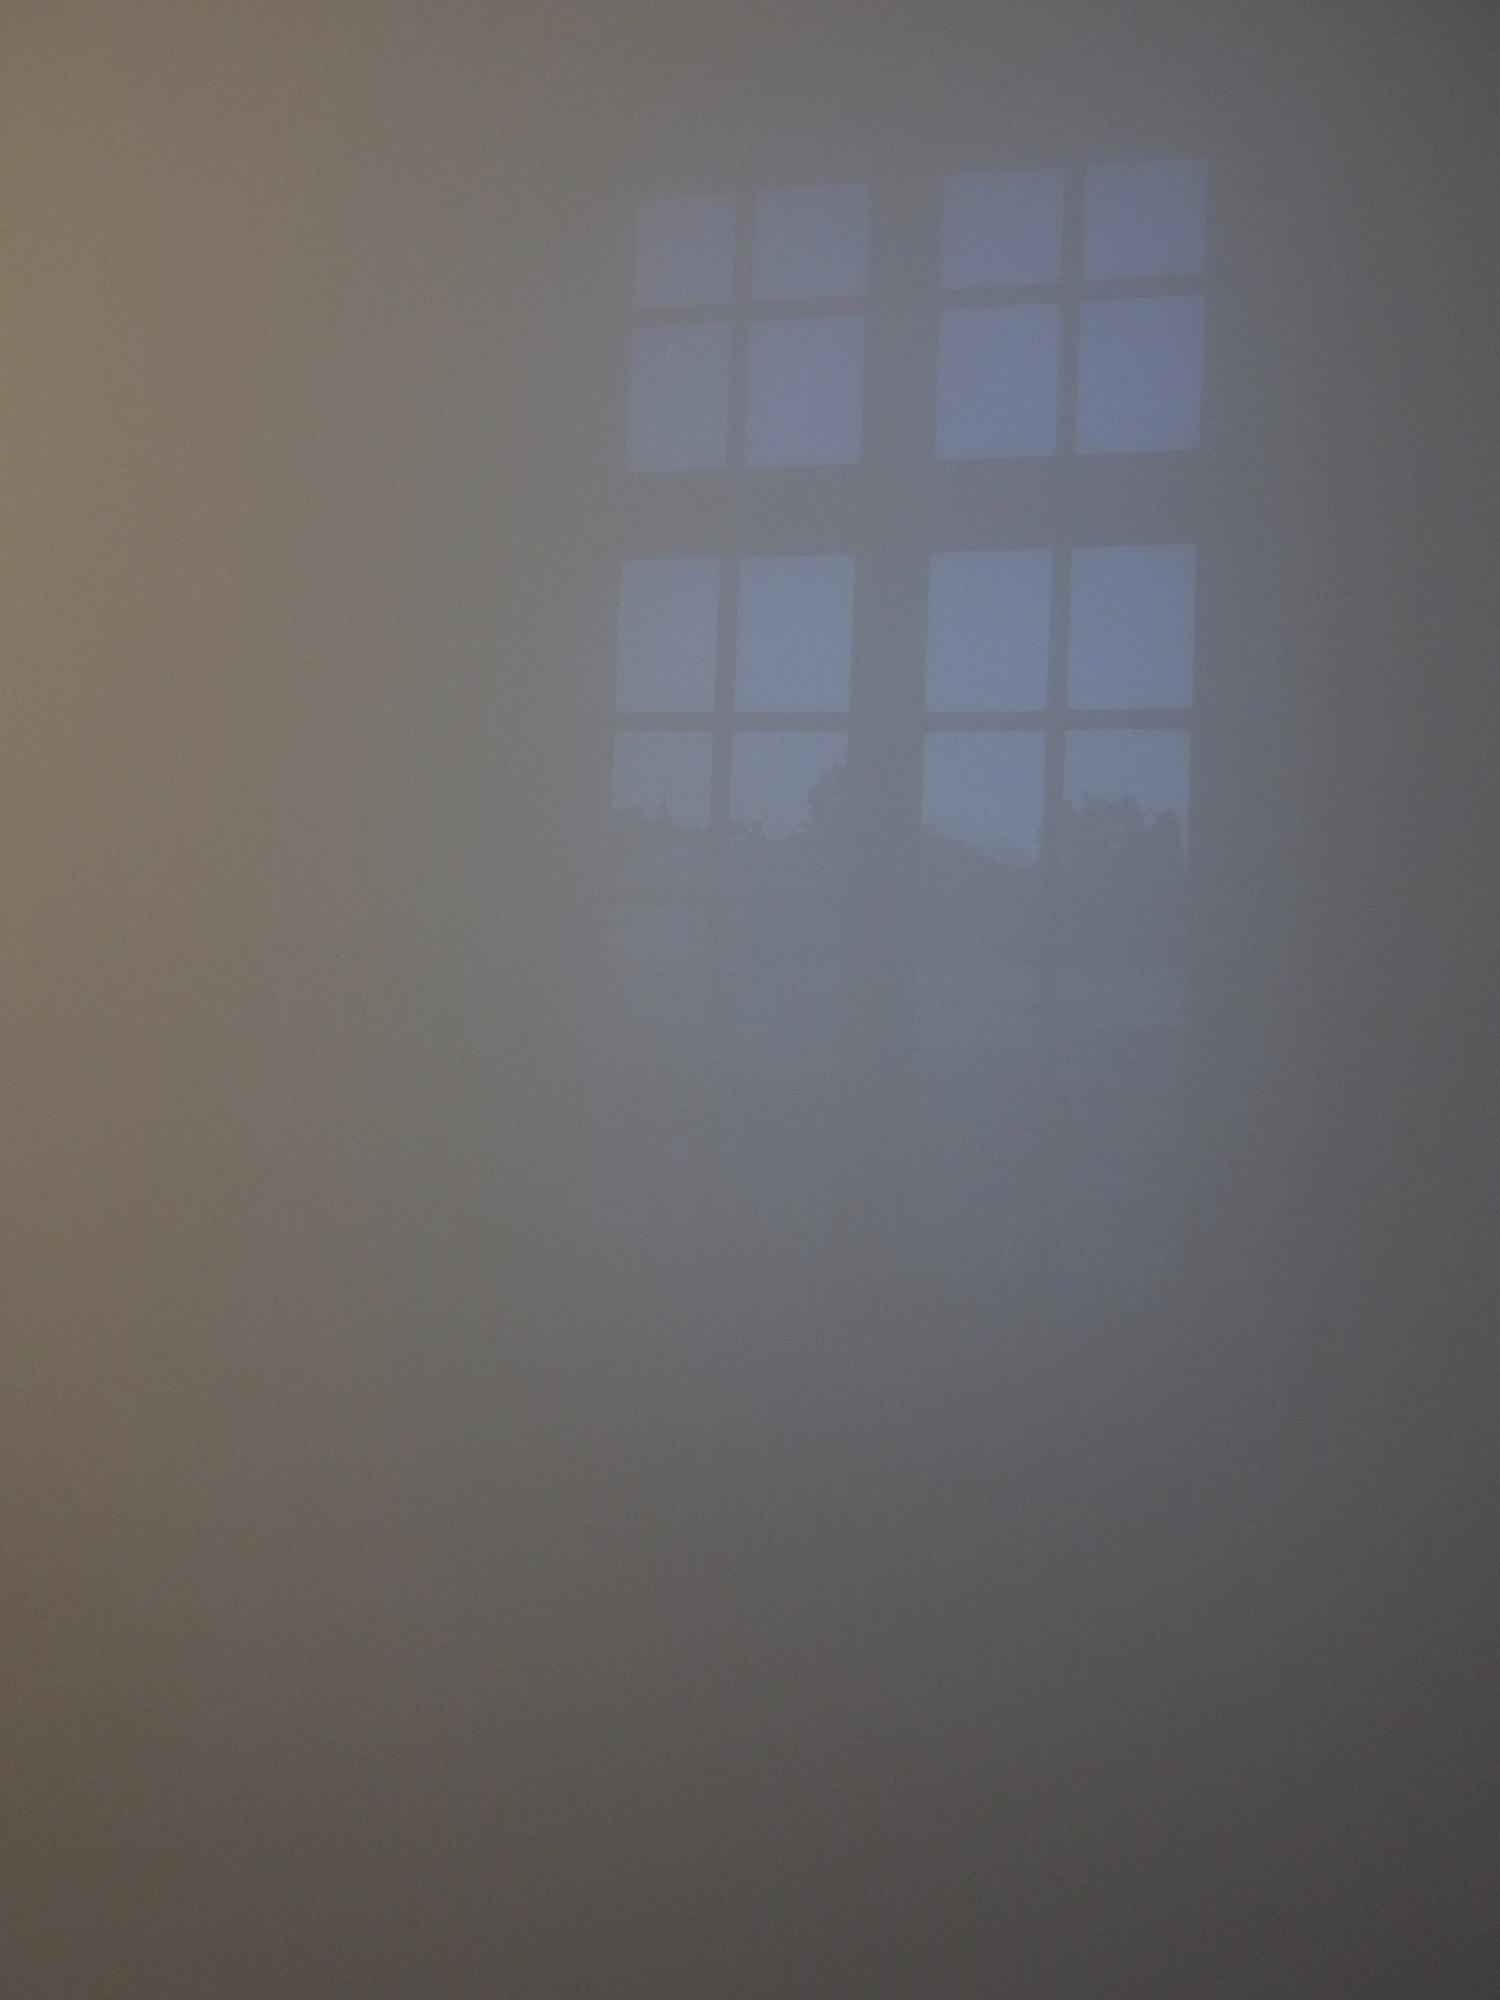 Lesbrumes-fenetre-web.jpg